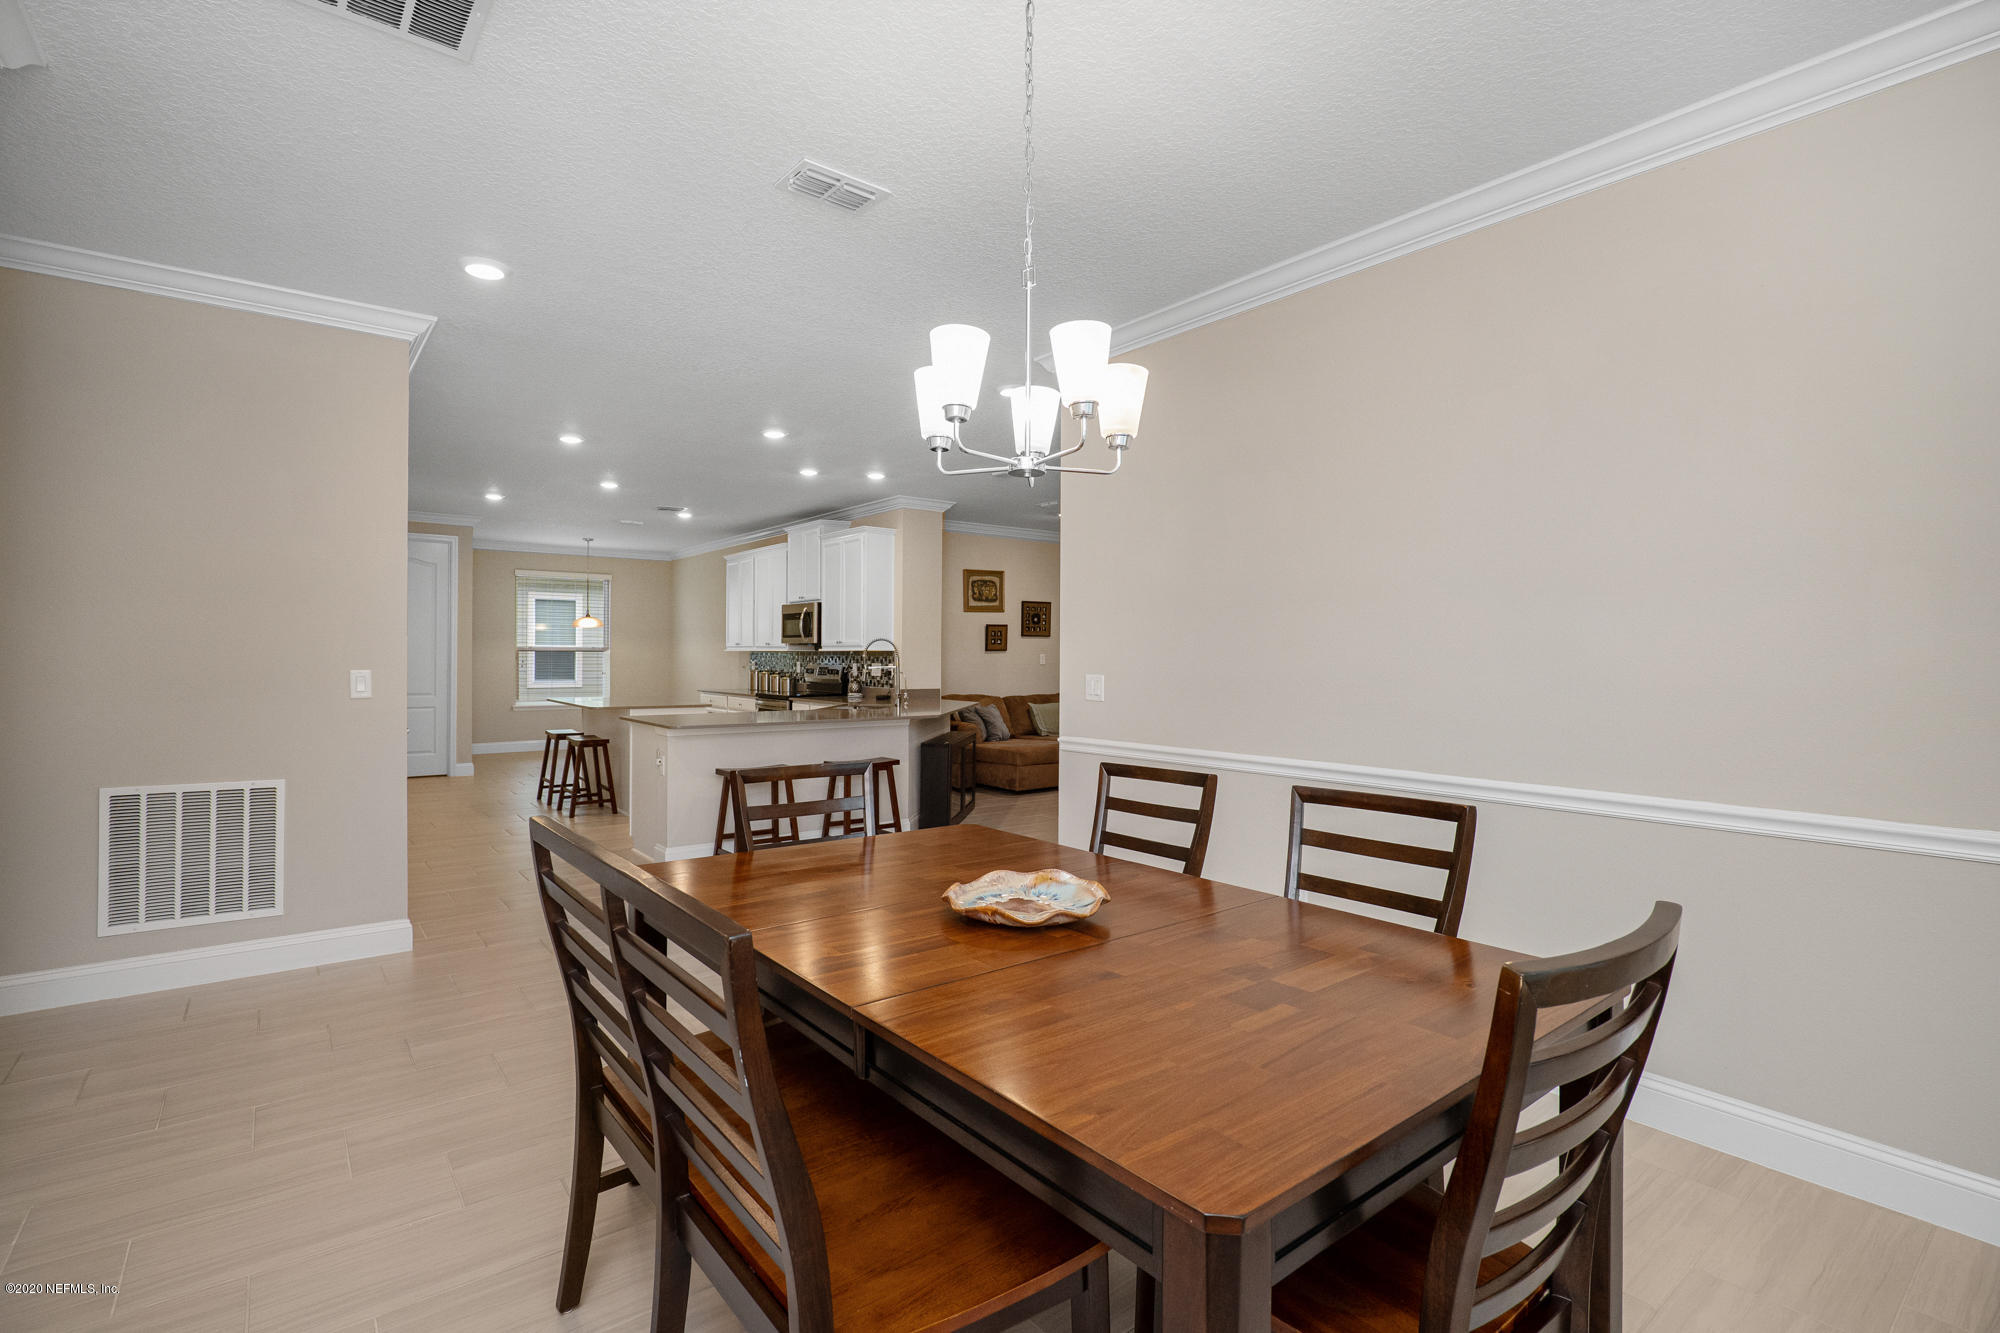 10817 JOHN RANDOLPH, JACKSONVILLE, FLORIDA 32257, 4 Bedrooms Bedrooms, ,3 BathroomsBathrooms,Residential,For sale,JOHN RANDOLPH,1082450